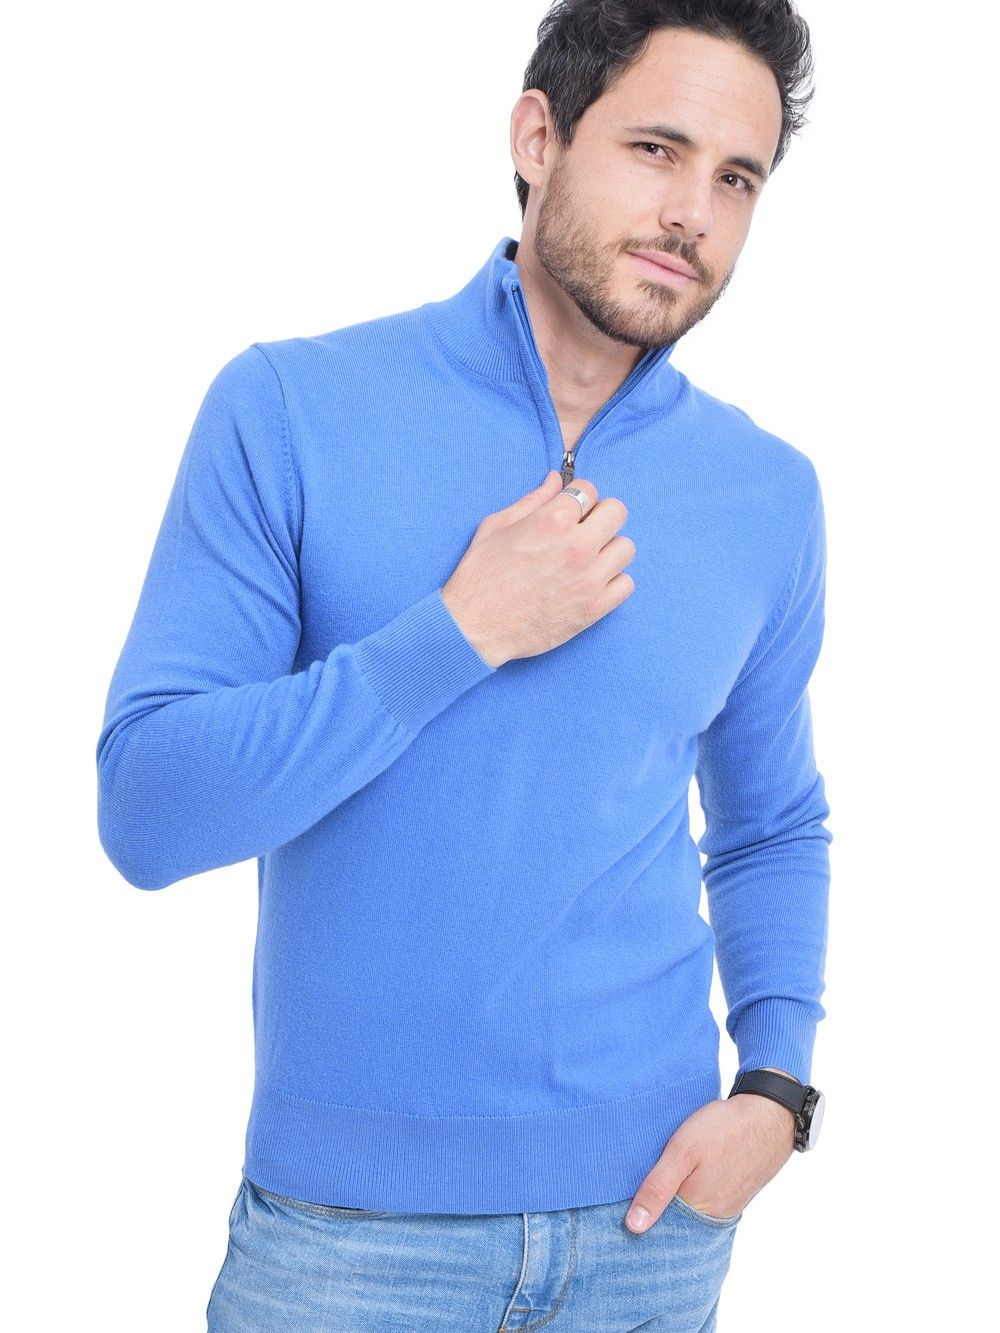 C&JO High Neck Half Zip Sweater with Leather Zip in Blue